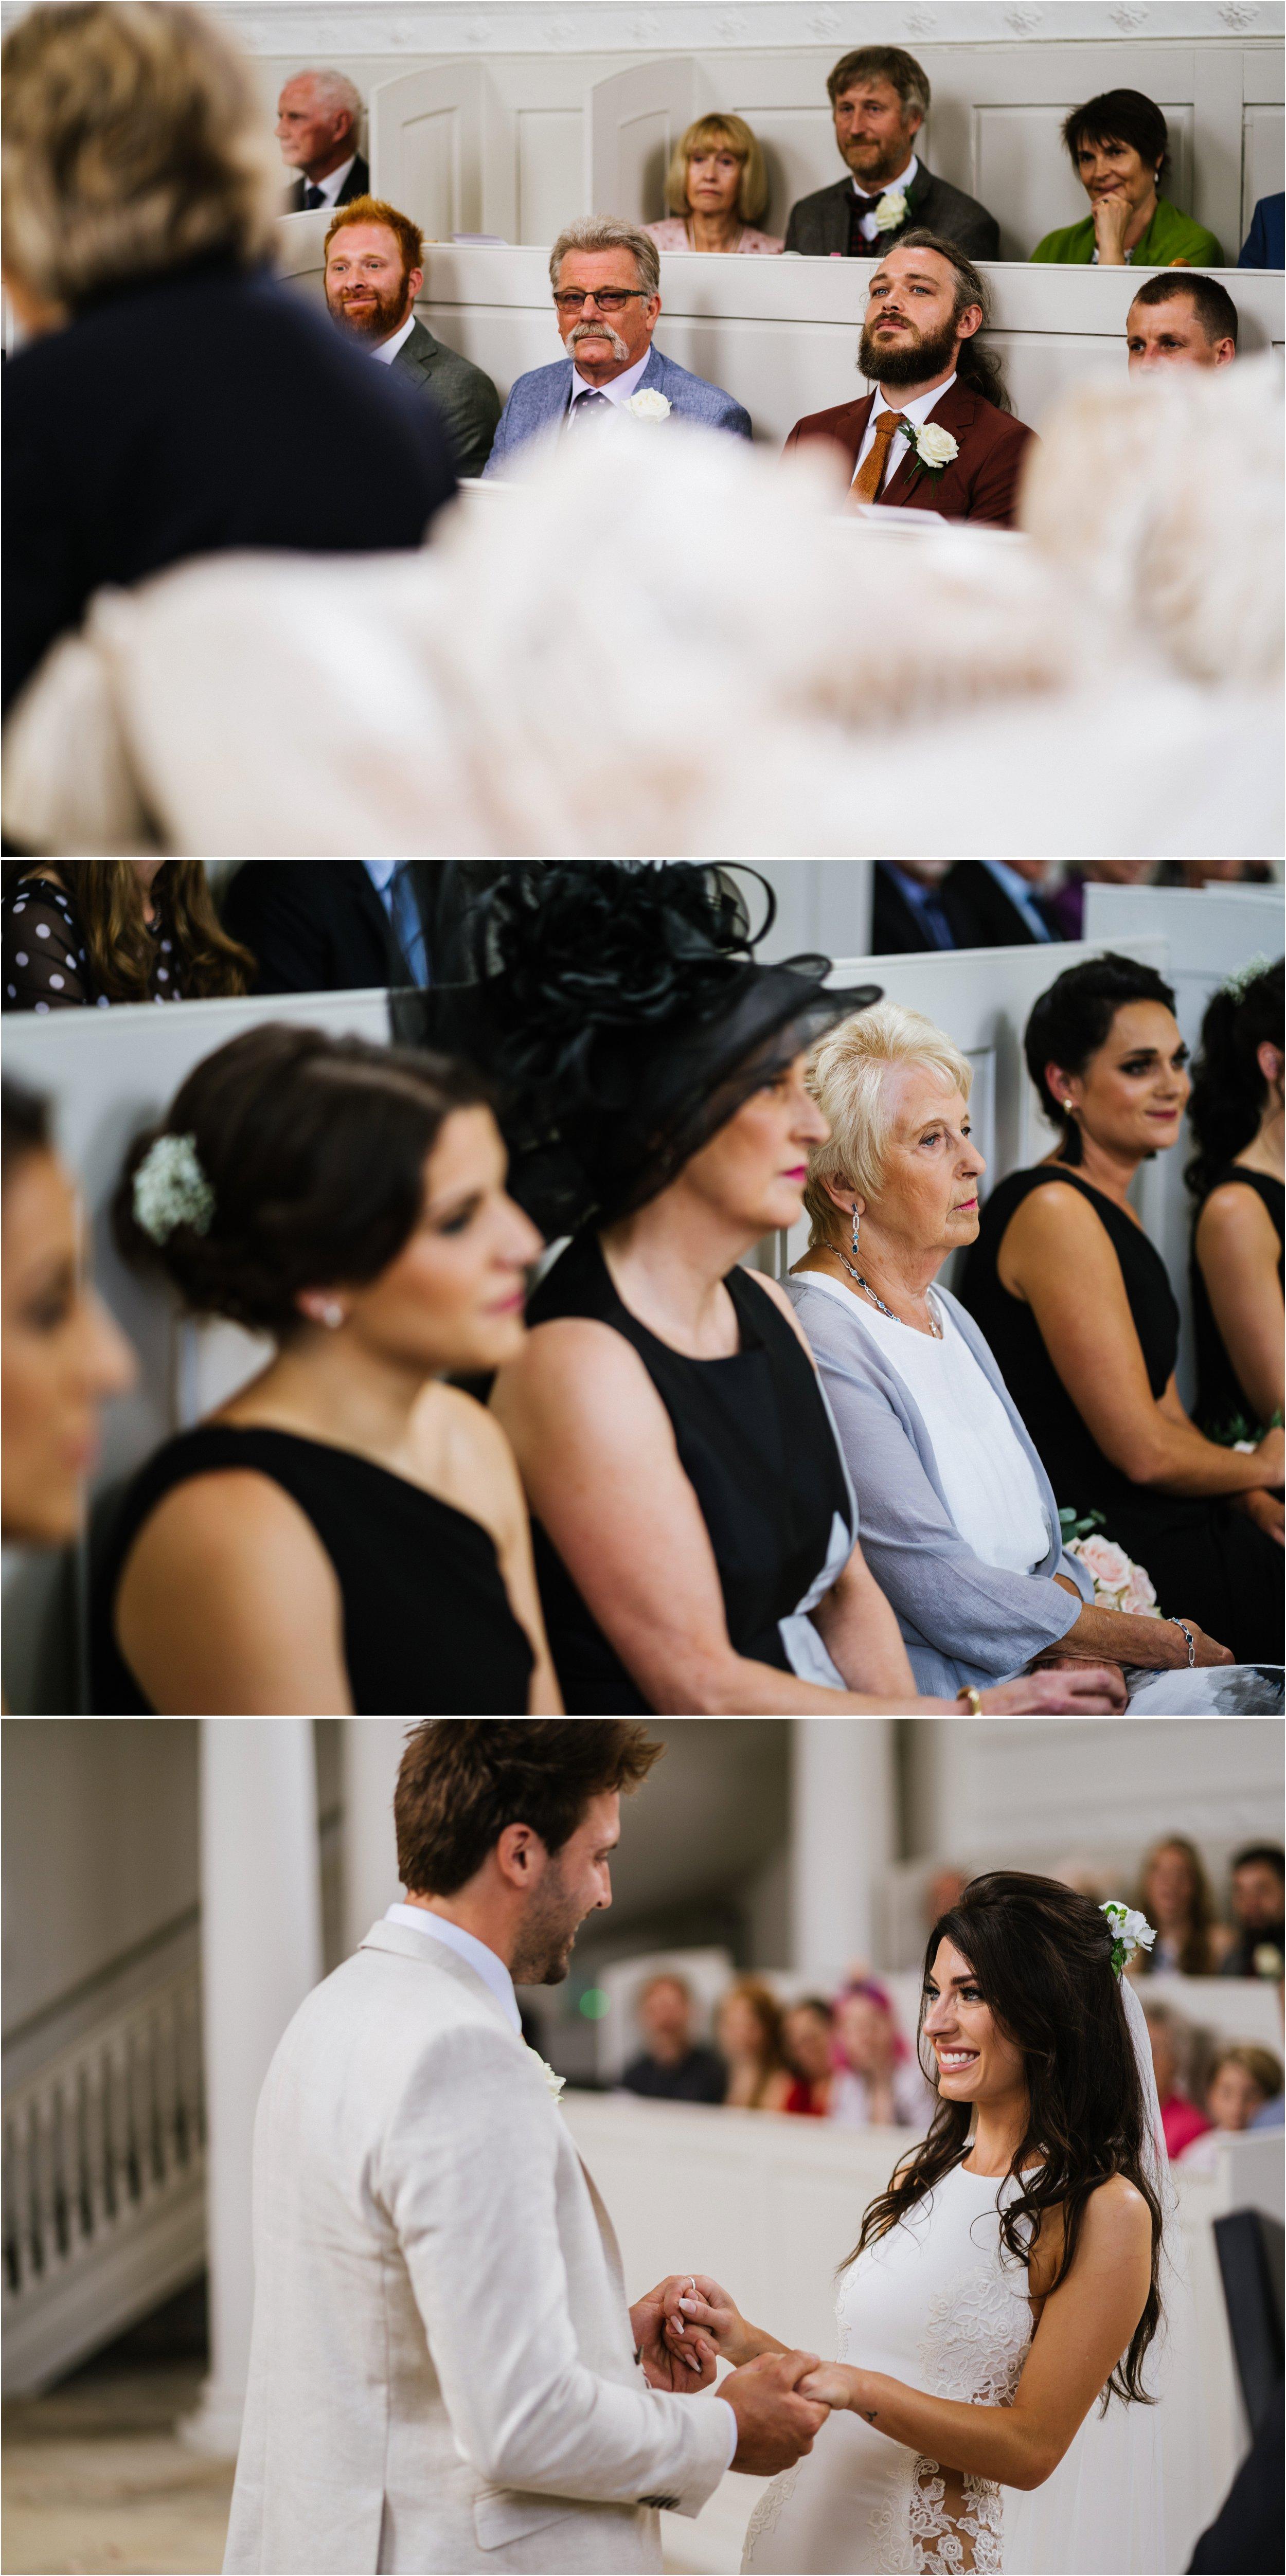 Compton Verney wedding photography_0062.jpg